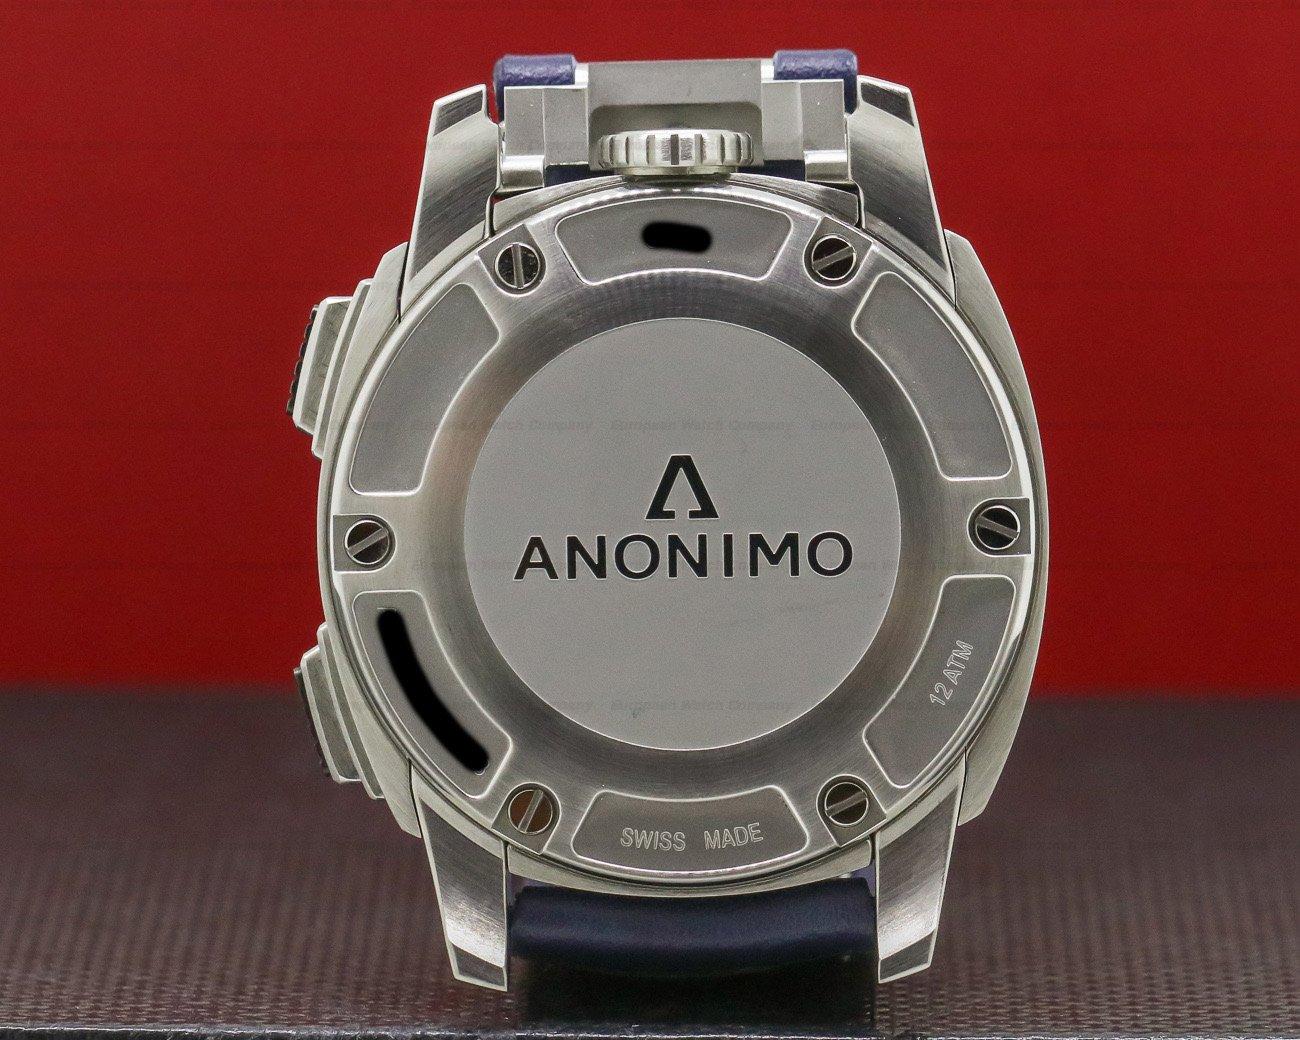 Anonimo AM-1120.01.003.A03 Militare Chrono Blue Dial SS